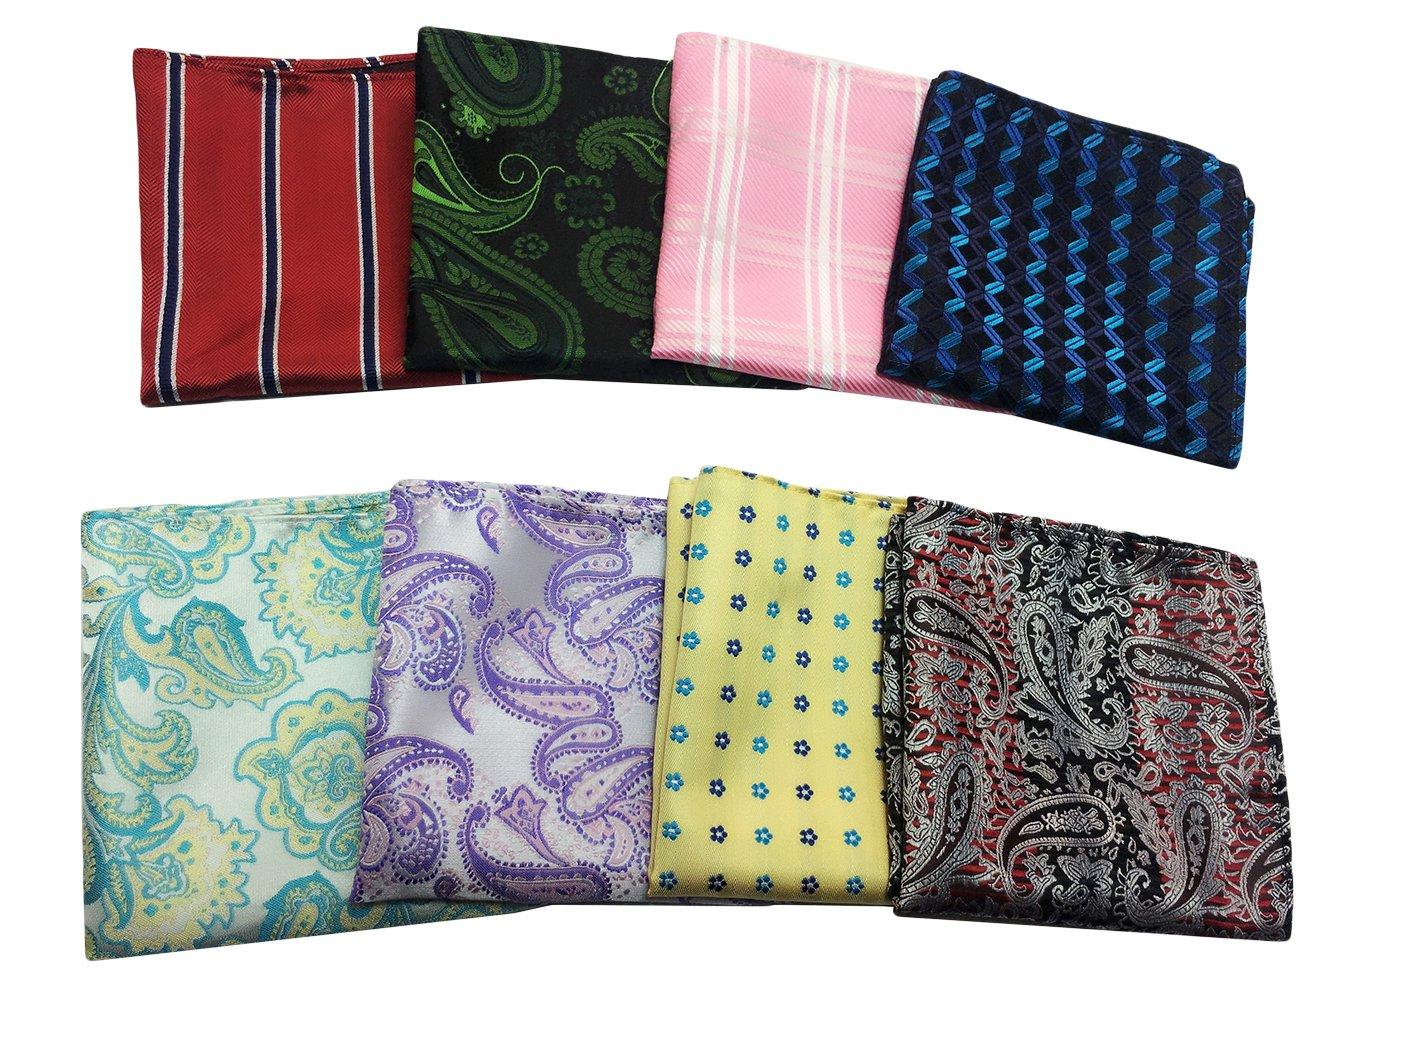 MENDENG 8 Pack Mixed Paisley Floral Pocket Square Wedding Men Handkerchief